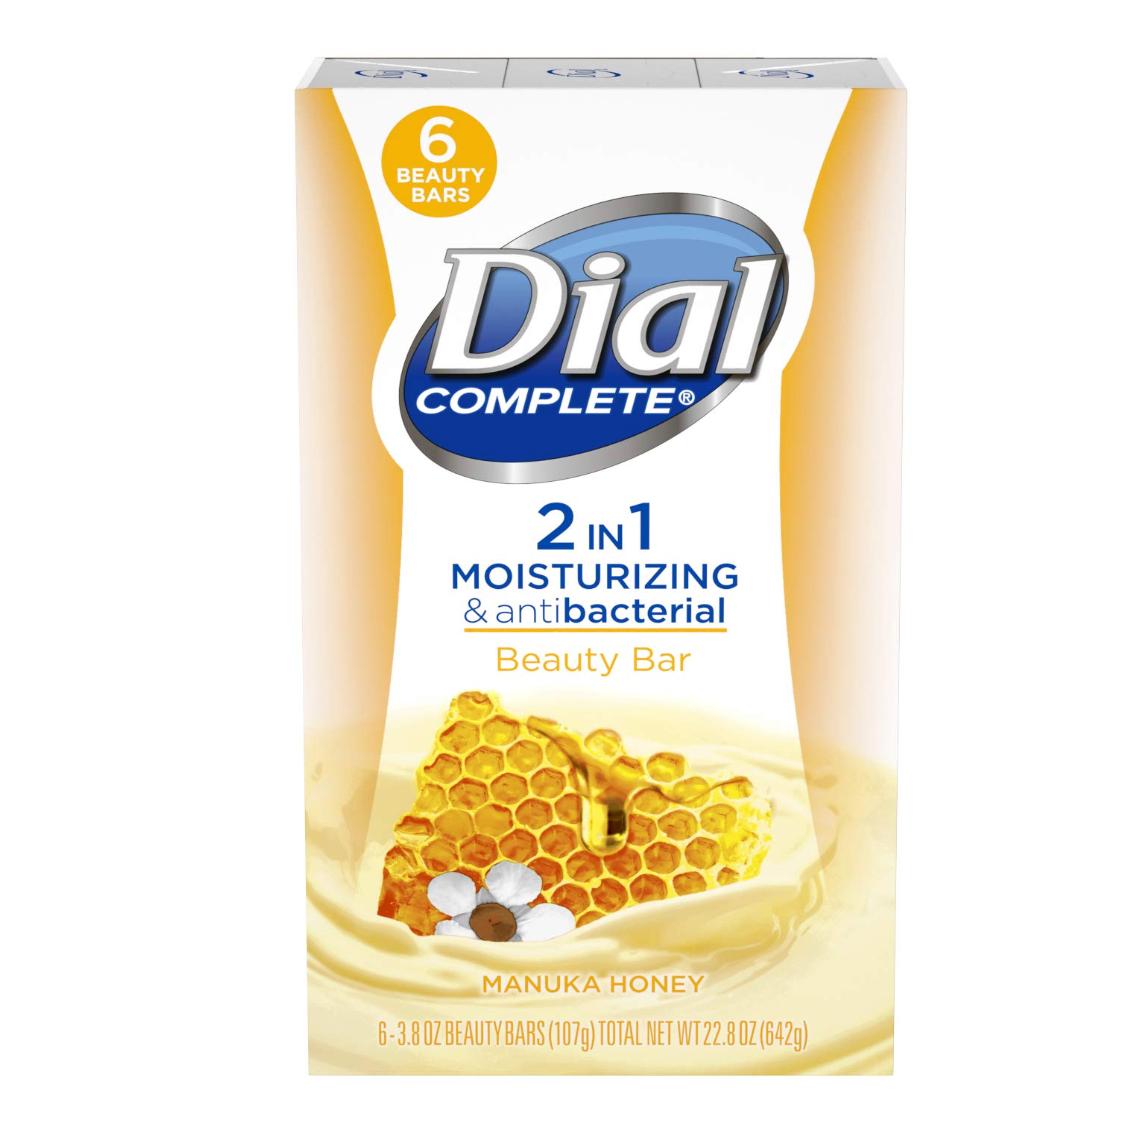 Dial beauty bar